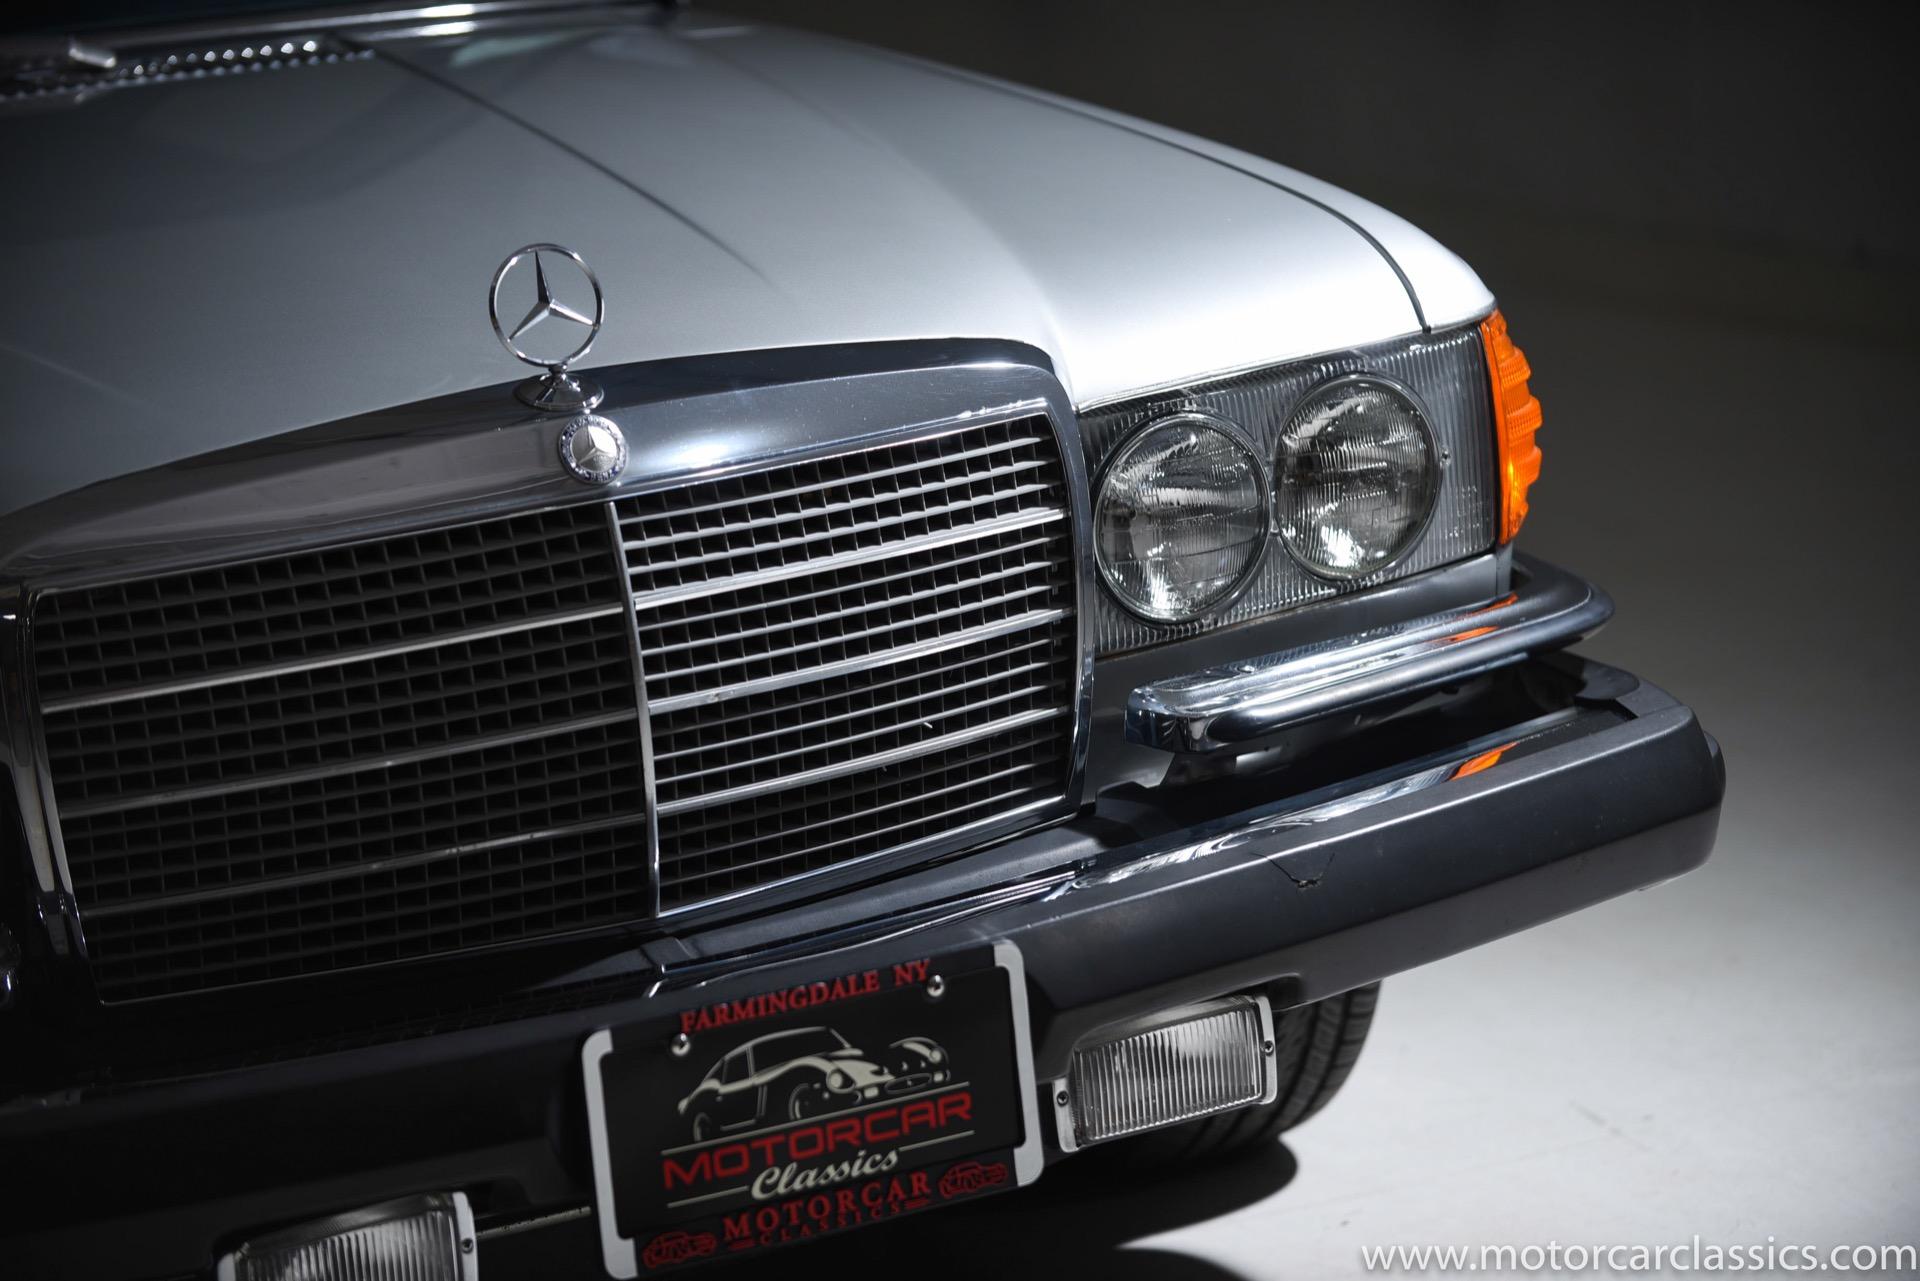 1979 Mercedes-Benz SEL-Class 450SEL